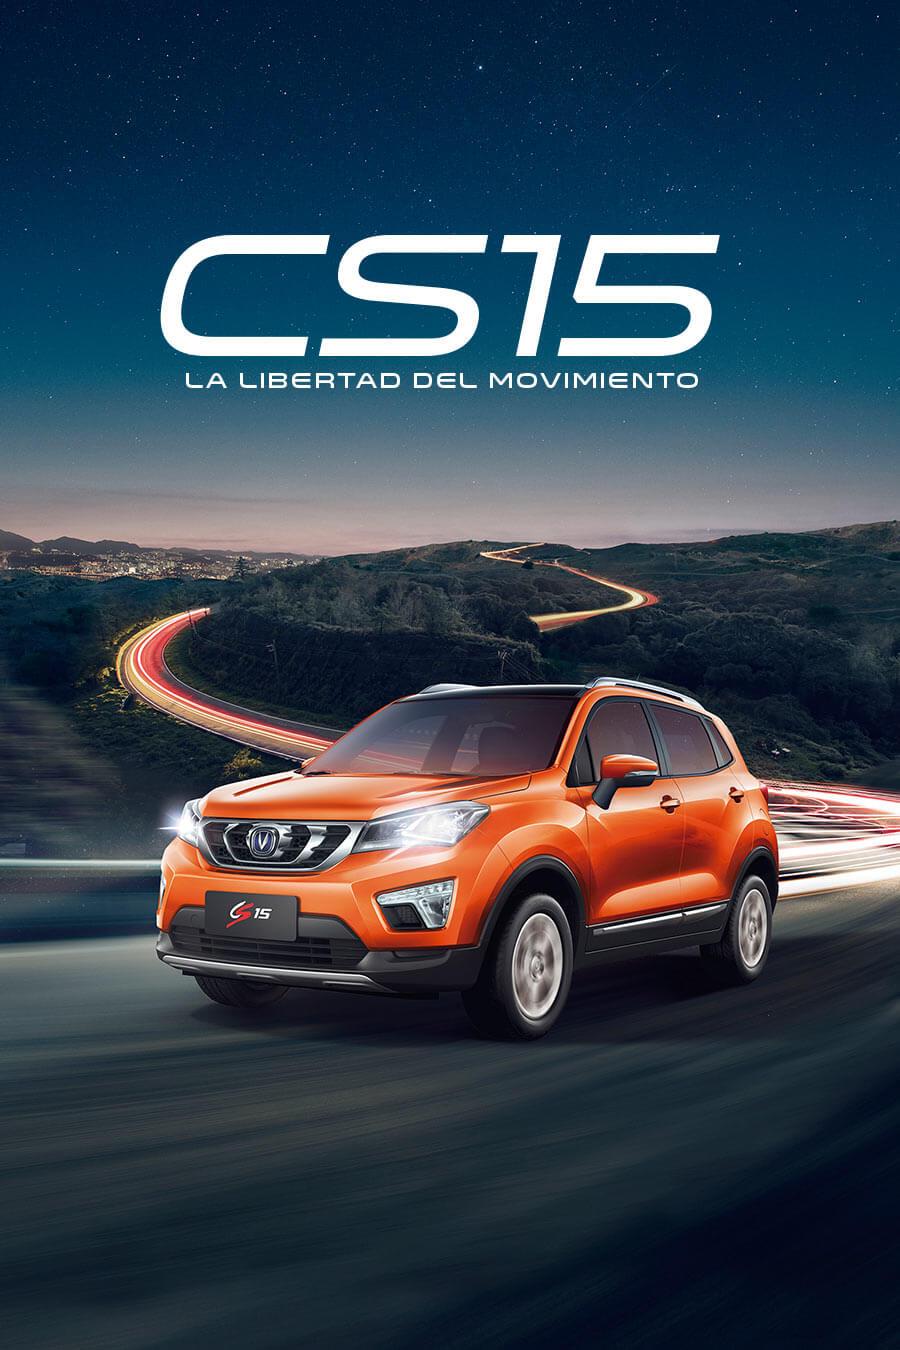 cs15-Mobile